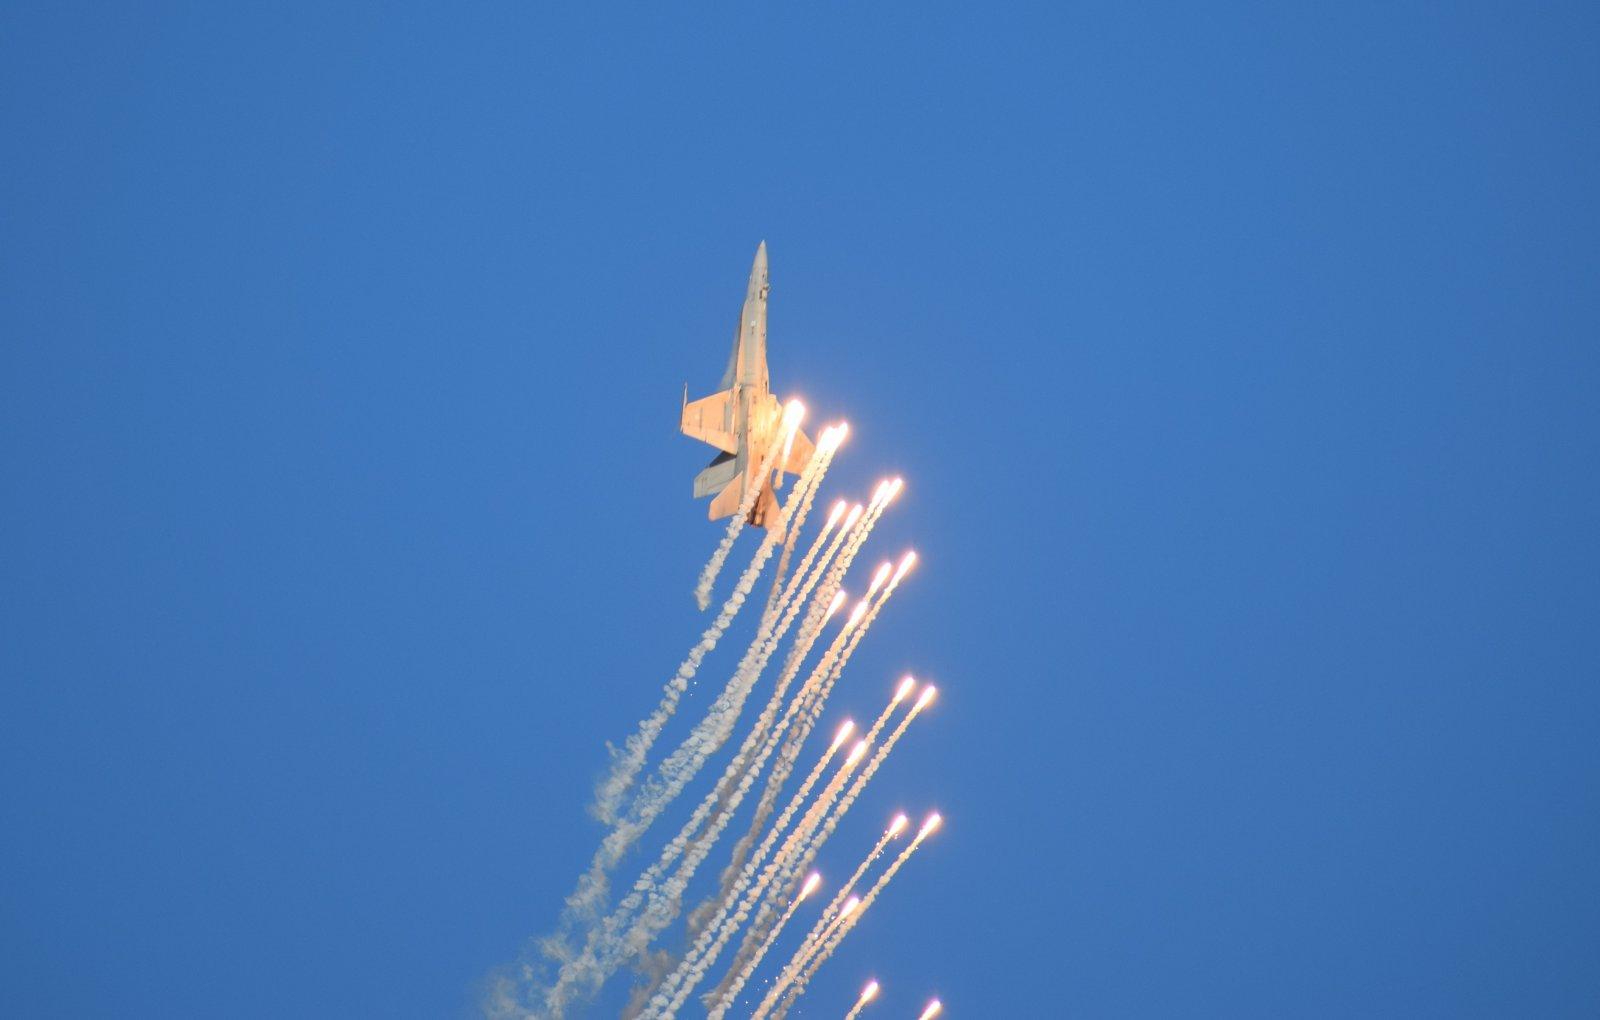 F/A-18C Hornet & flares